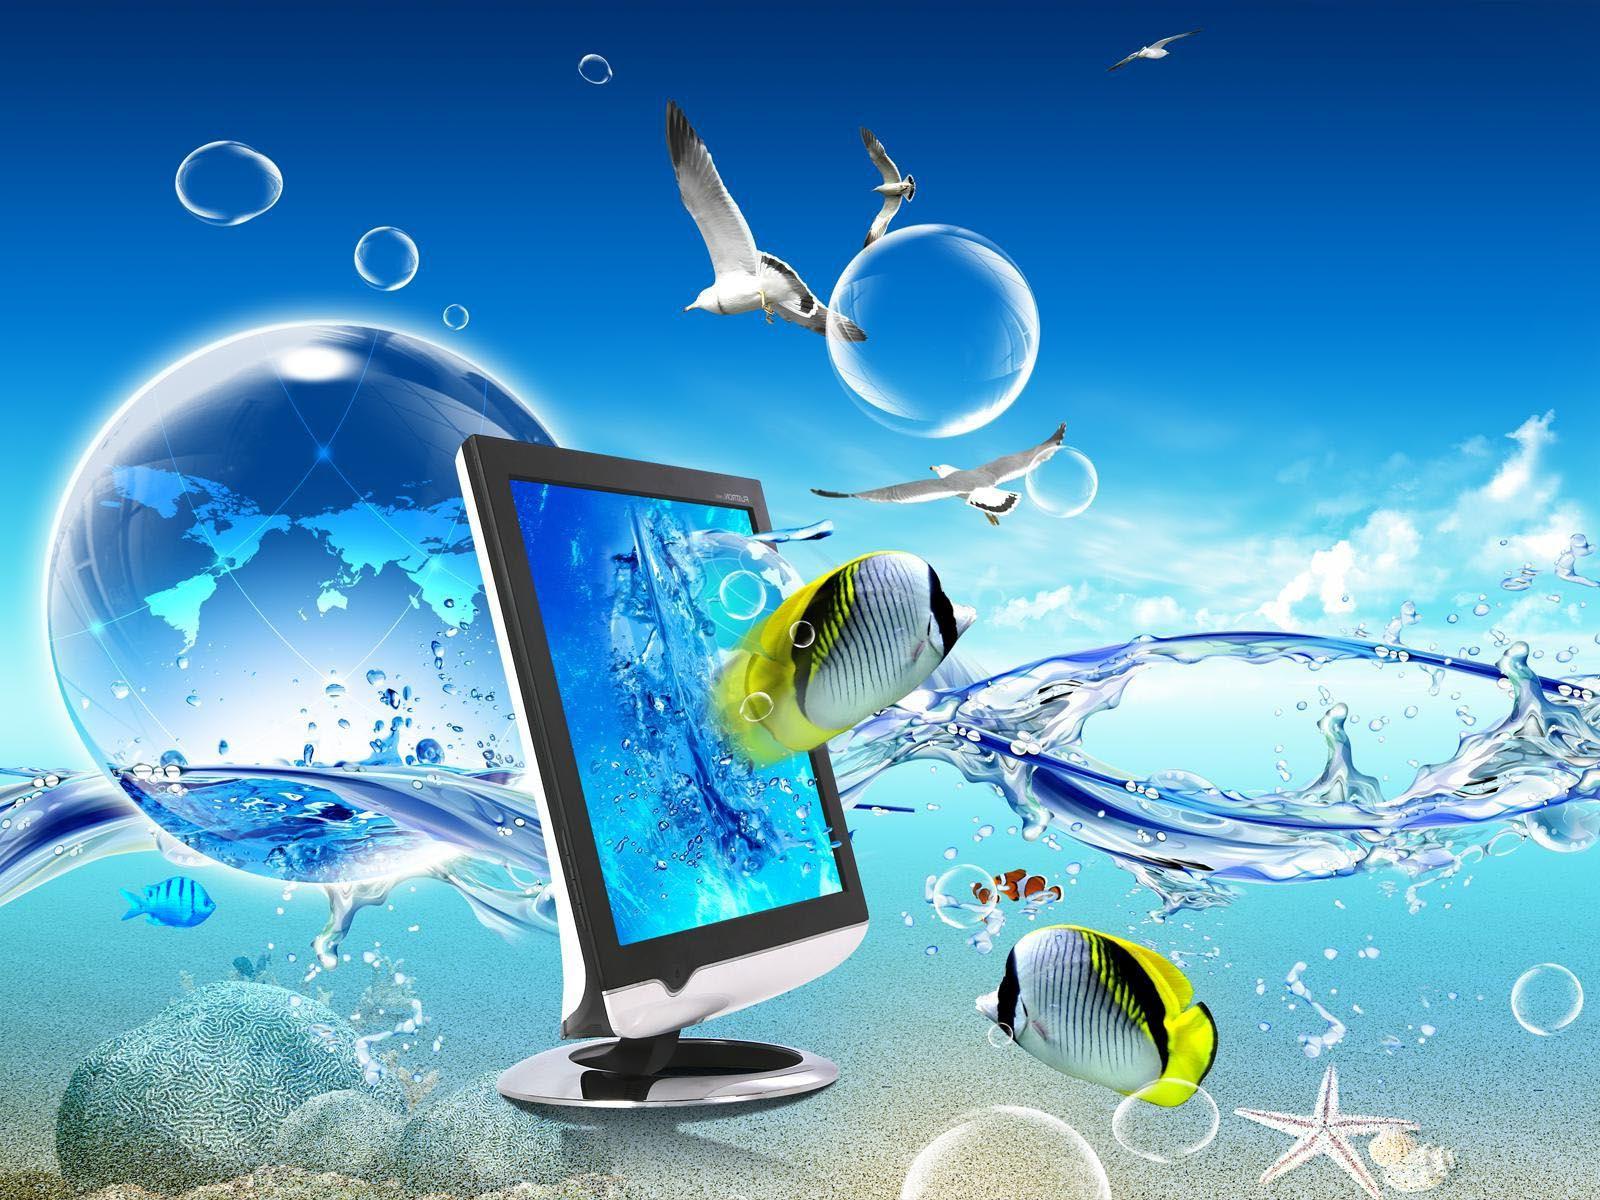 pc desktop wallpapers hd